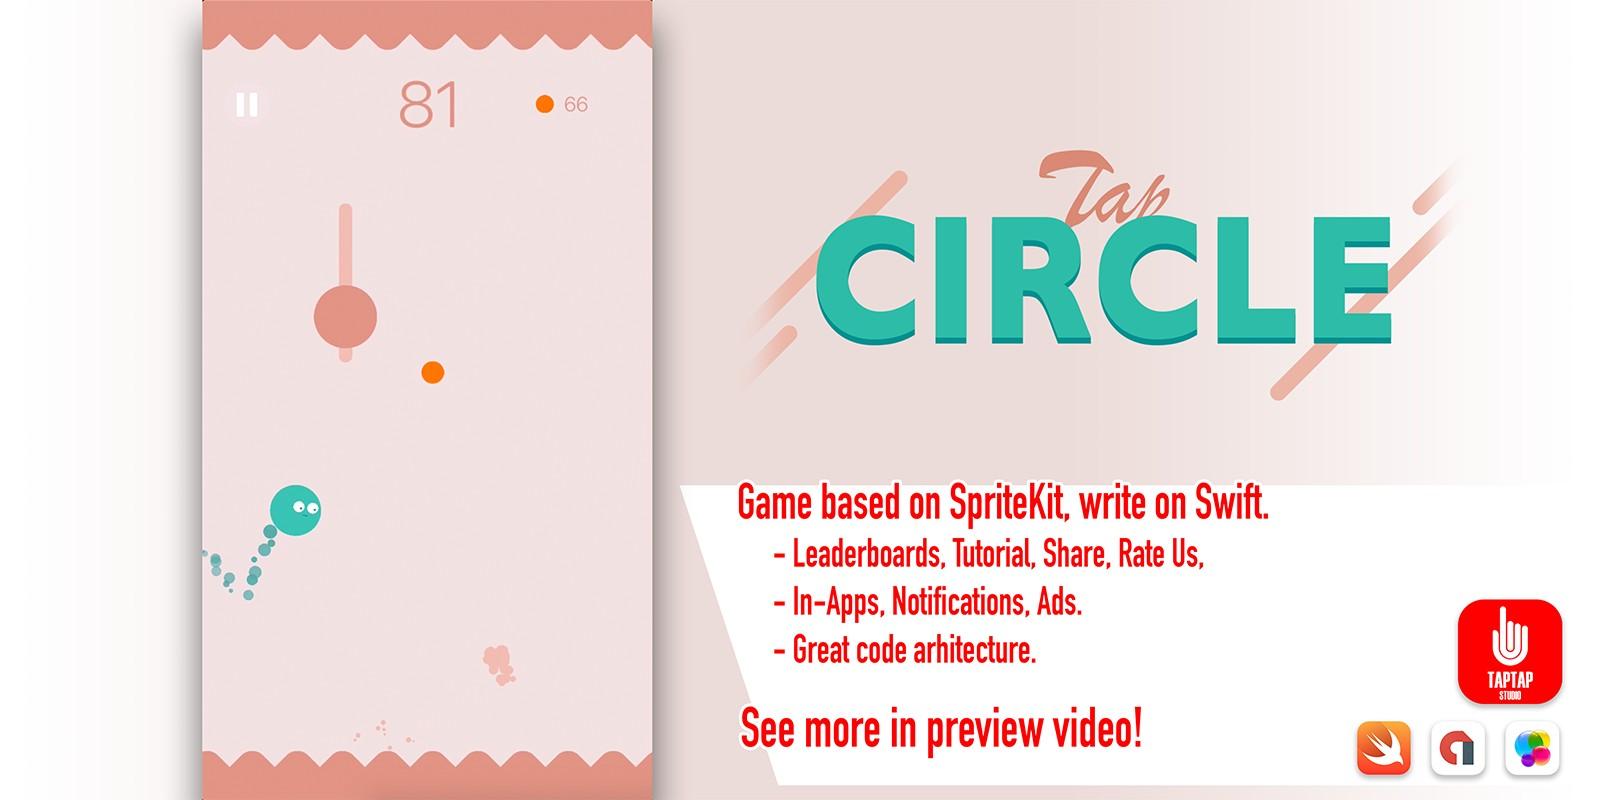 Tap Circle - iOS Game Source Code